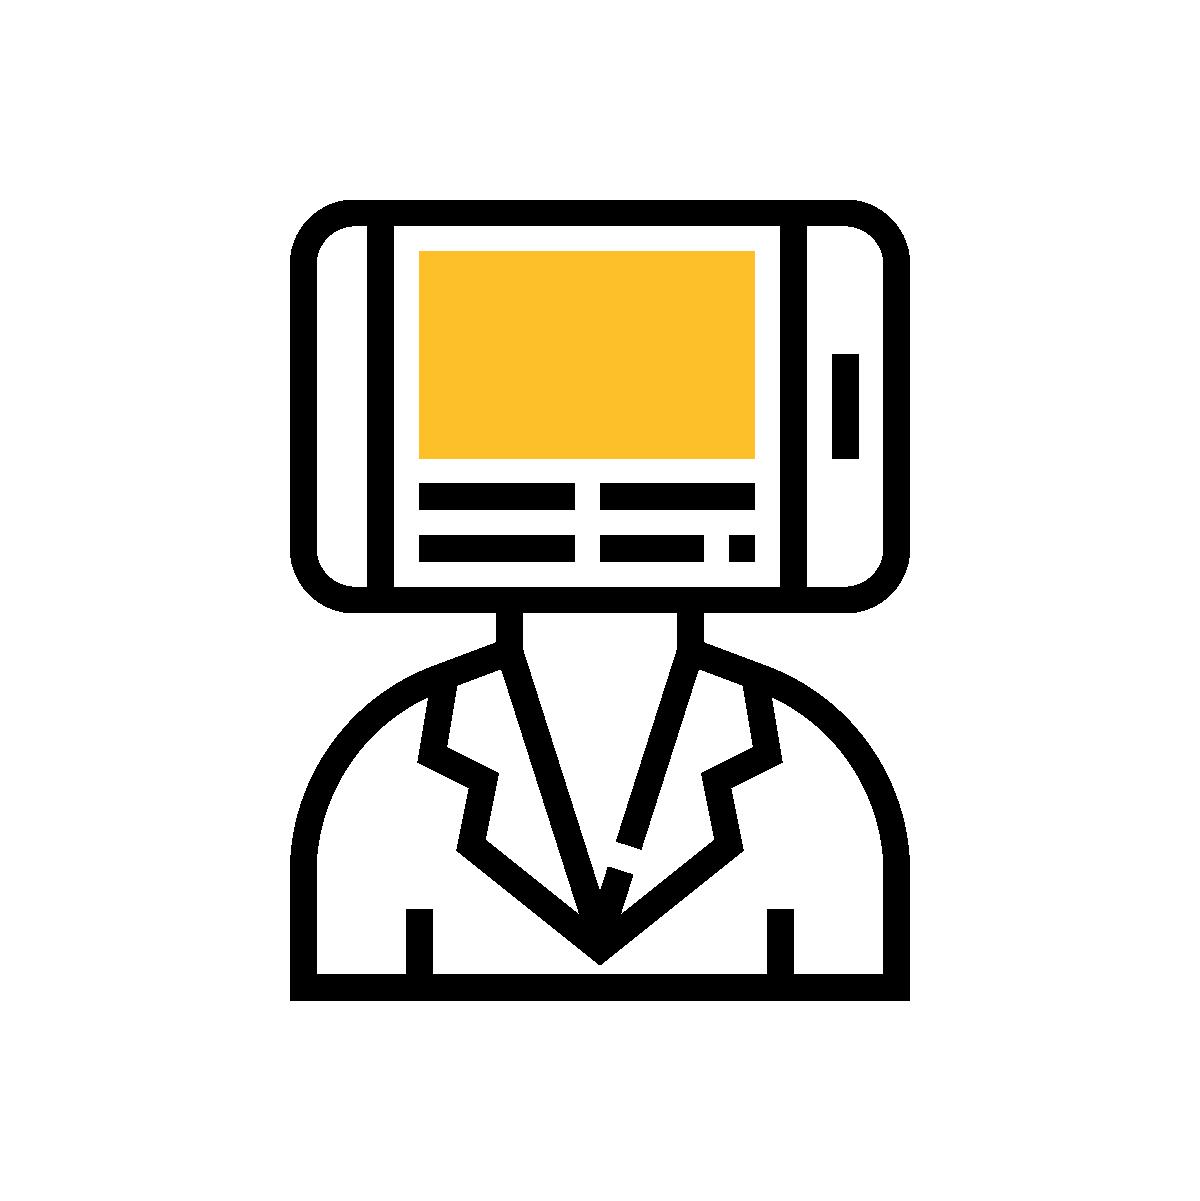 AG - Icon - Smartphone